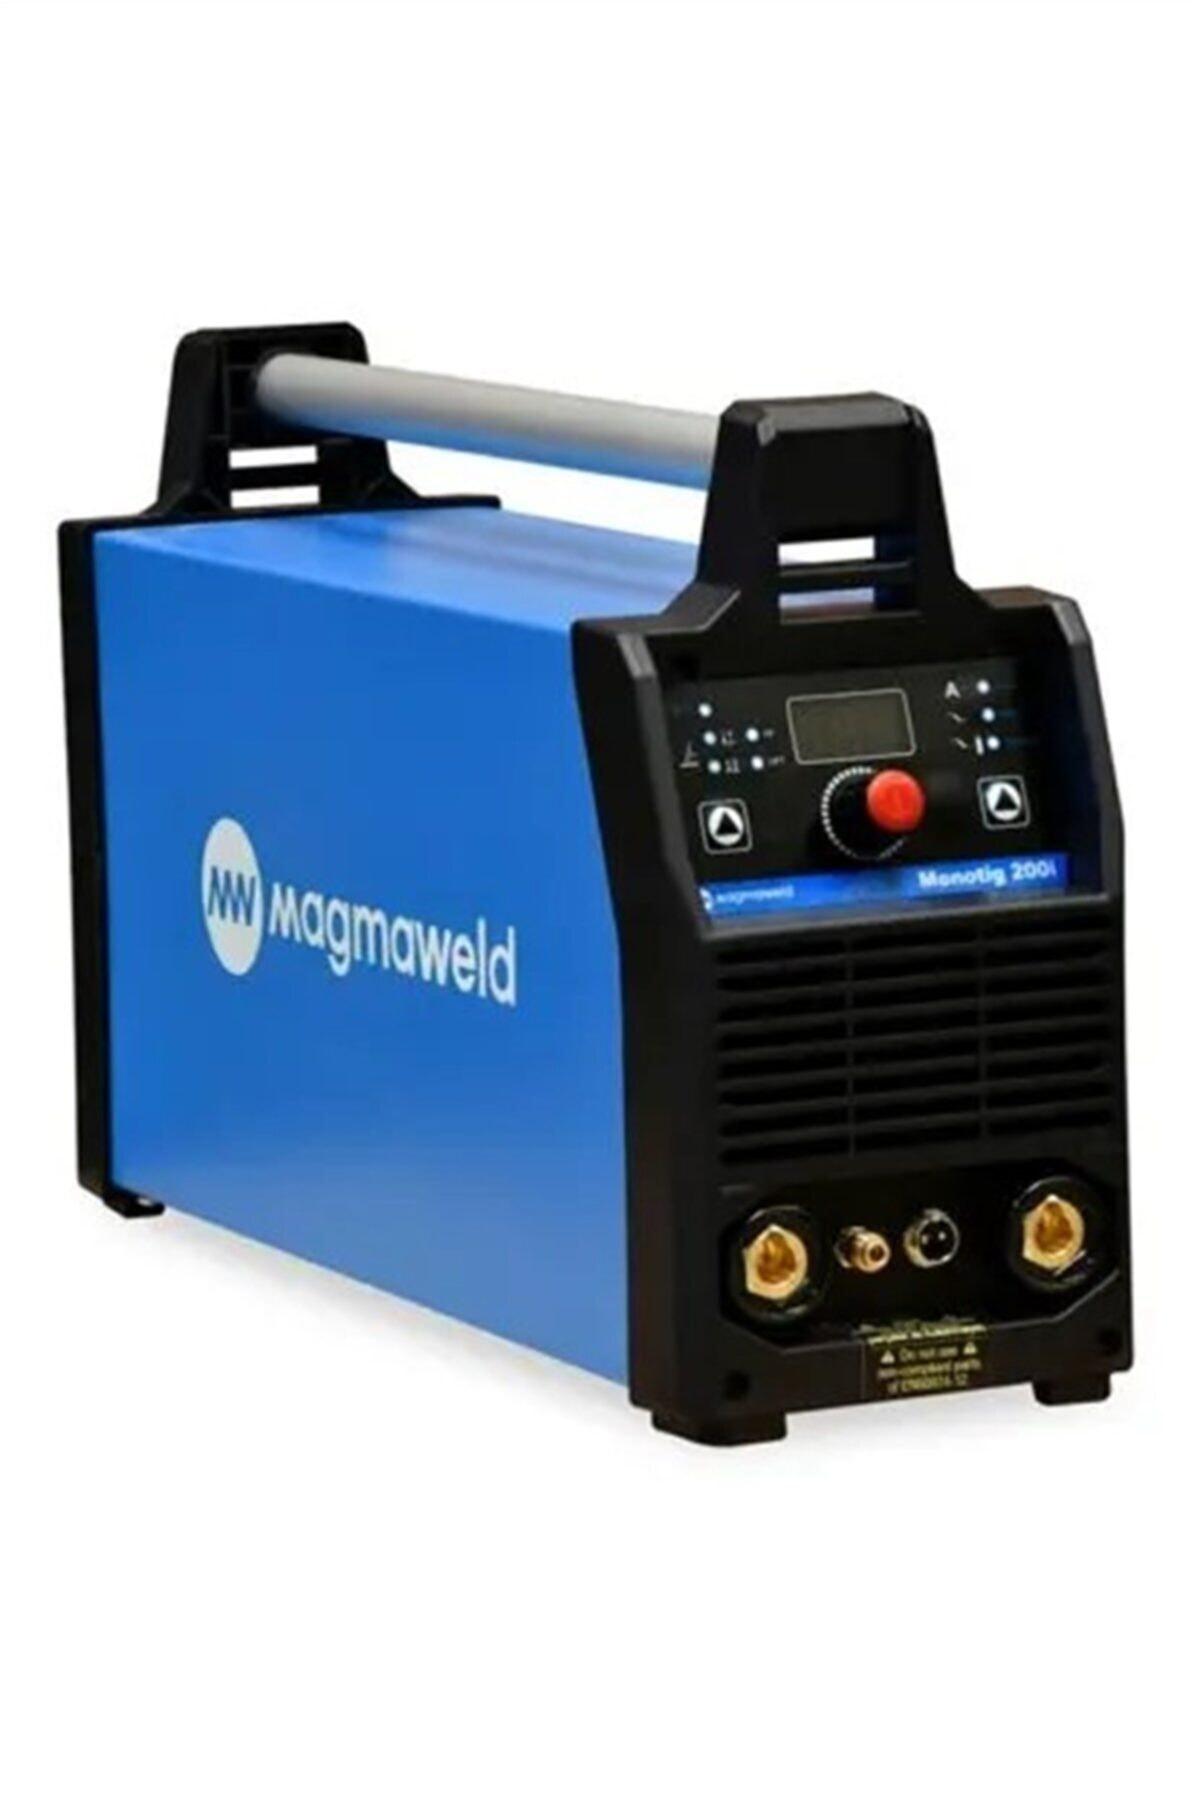 Magmaweld Ministick 165 Amper Inventer Kaynak Makinesi 1